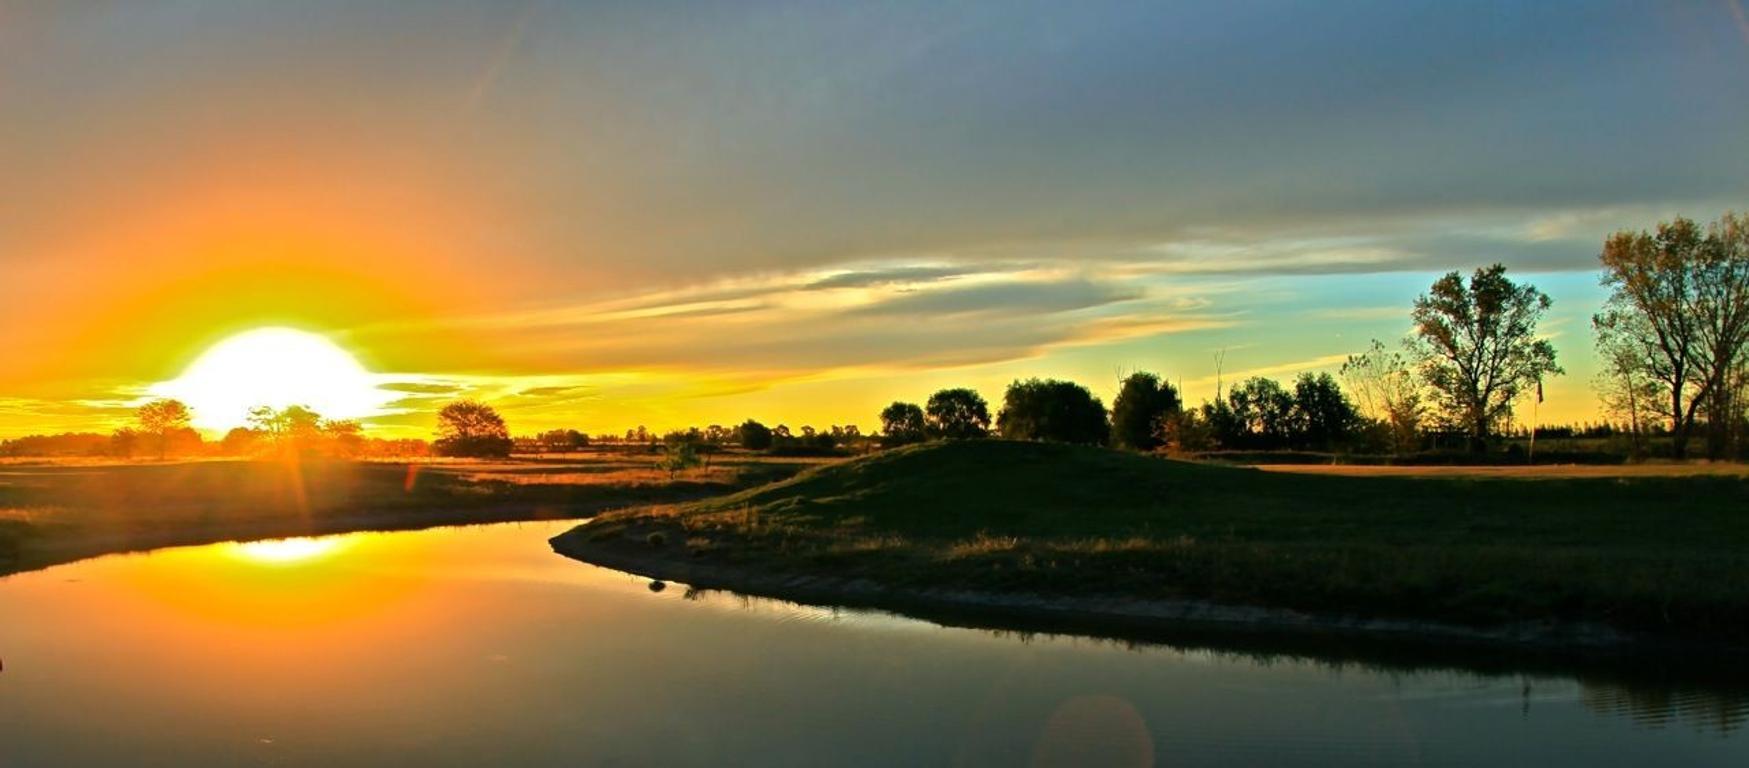 Tizado Pilar vende lotes al golf en Medal CC, Pilar y Alrededores - PIL3849_LP172637_1